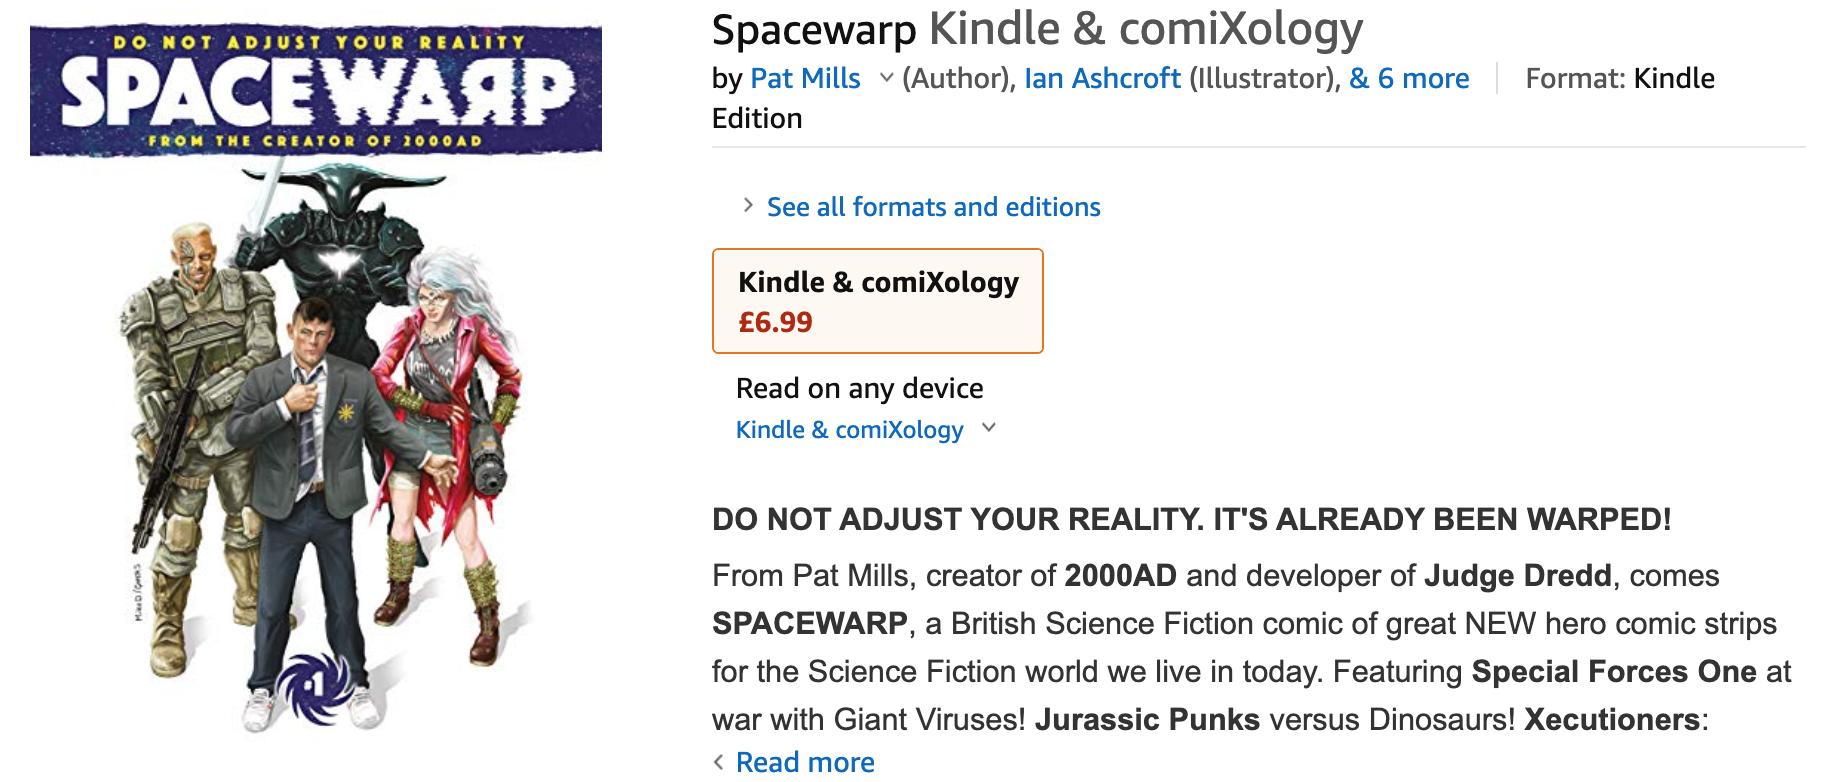 Spacewarp on Amazon Kindle